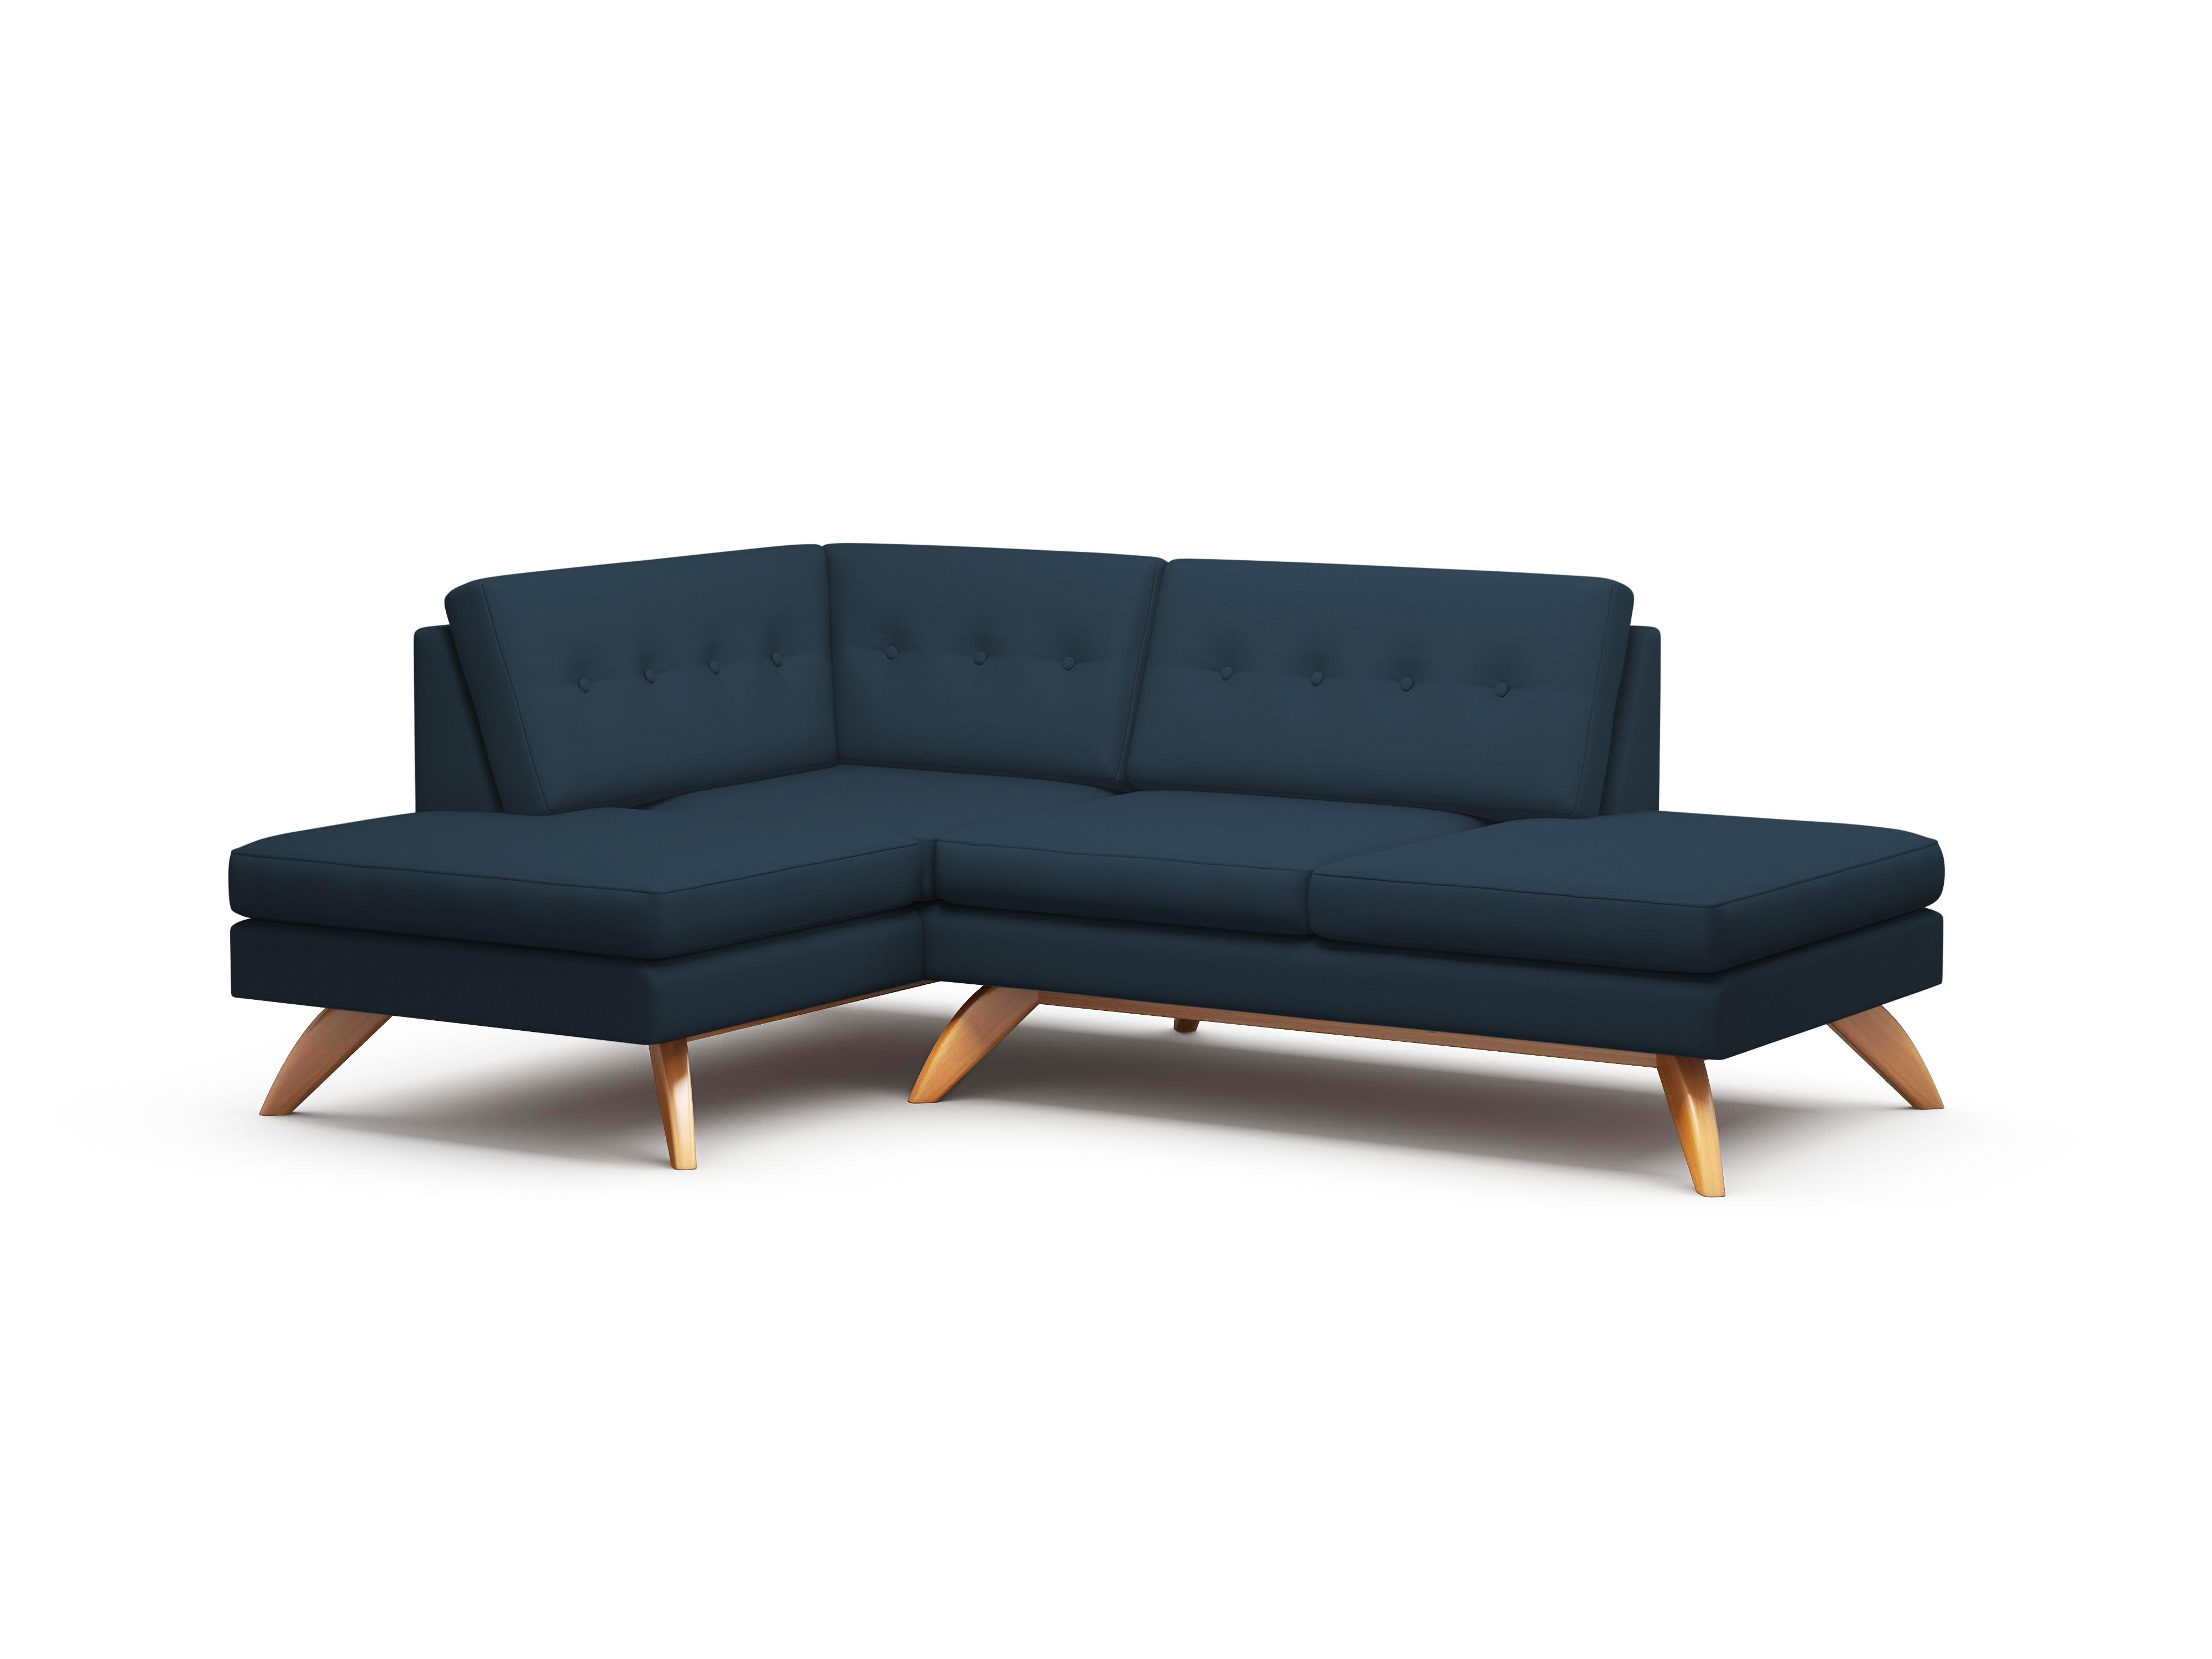 Luna Double Bumper Loft Sofa – Truemodern™ With Regard To Loft Arm Sofa Chairs (View 20 of 25)